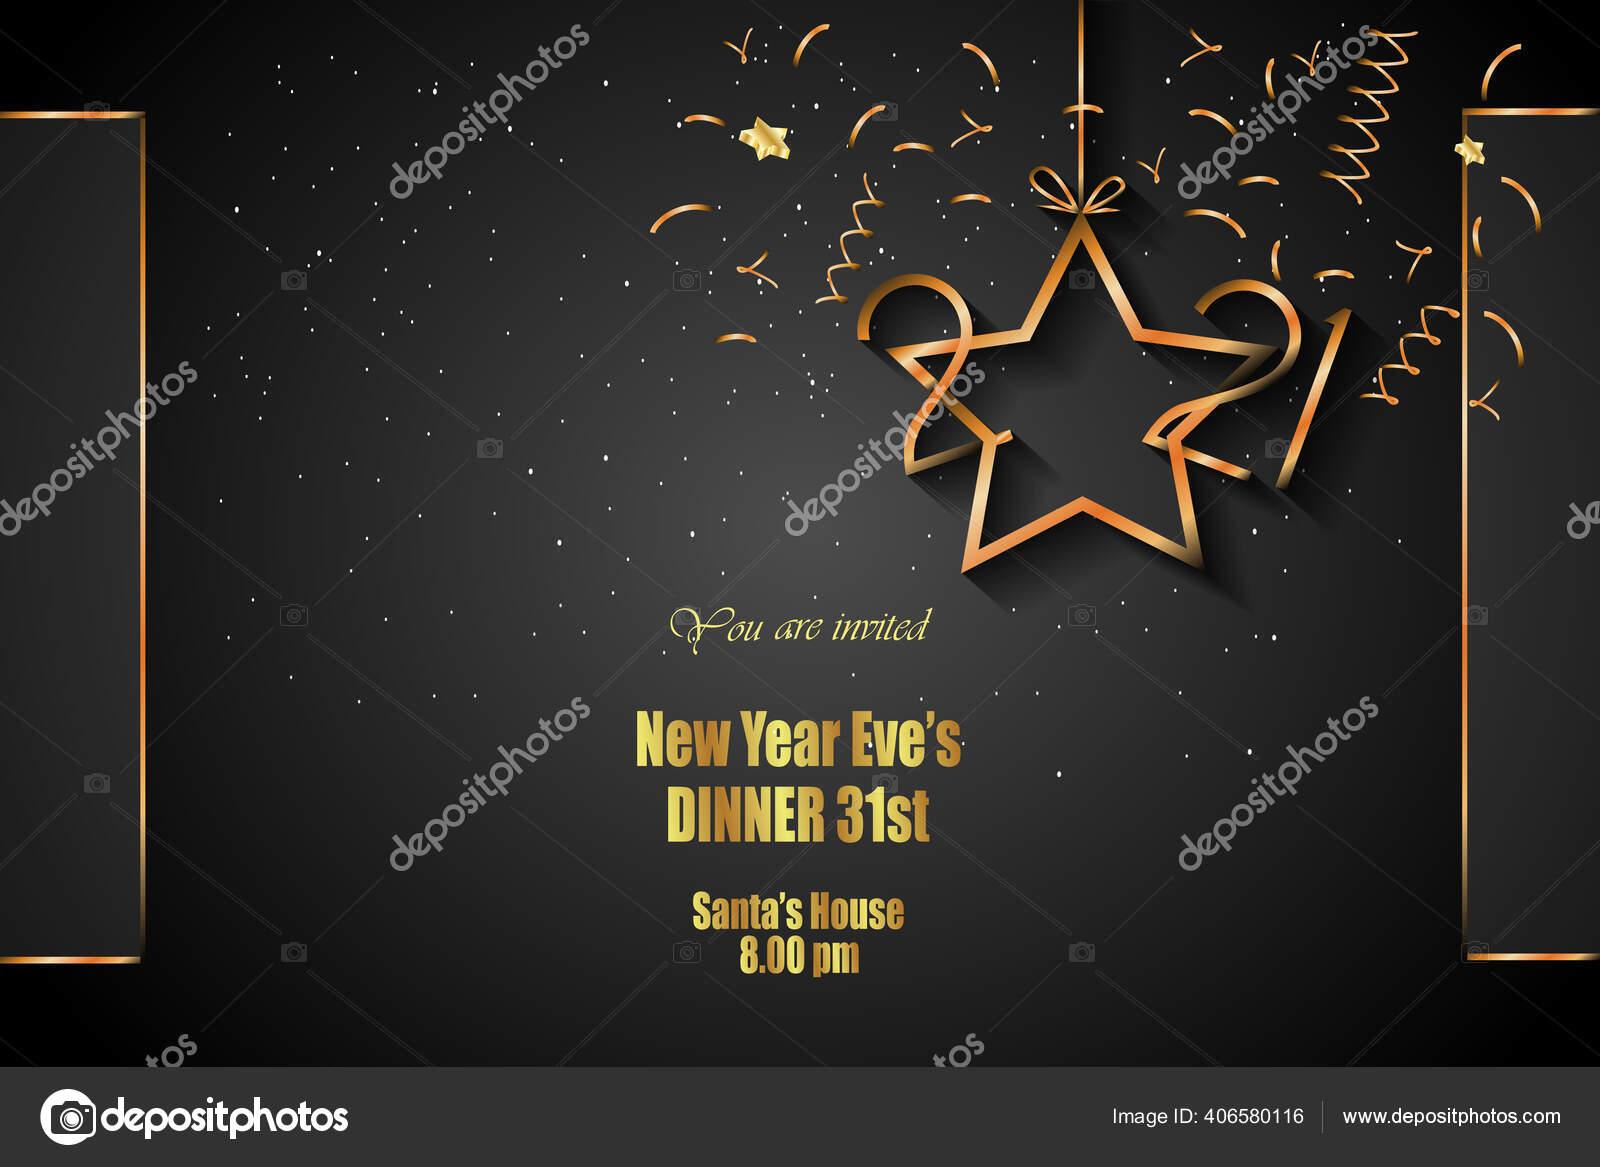 2021 happy new year background your seasonal invitations festive posters stock vector c plutonii 406580116 depositphotos